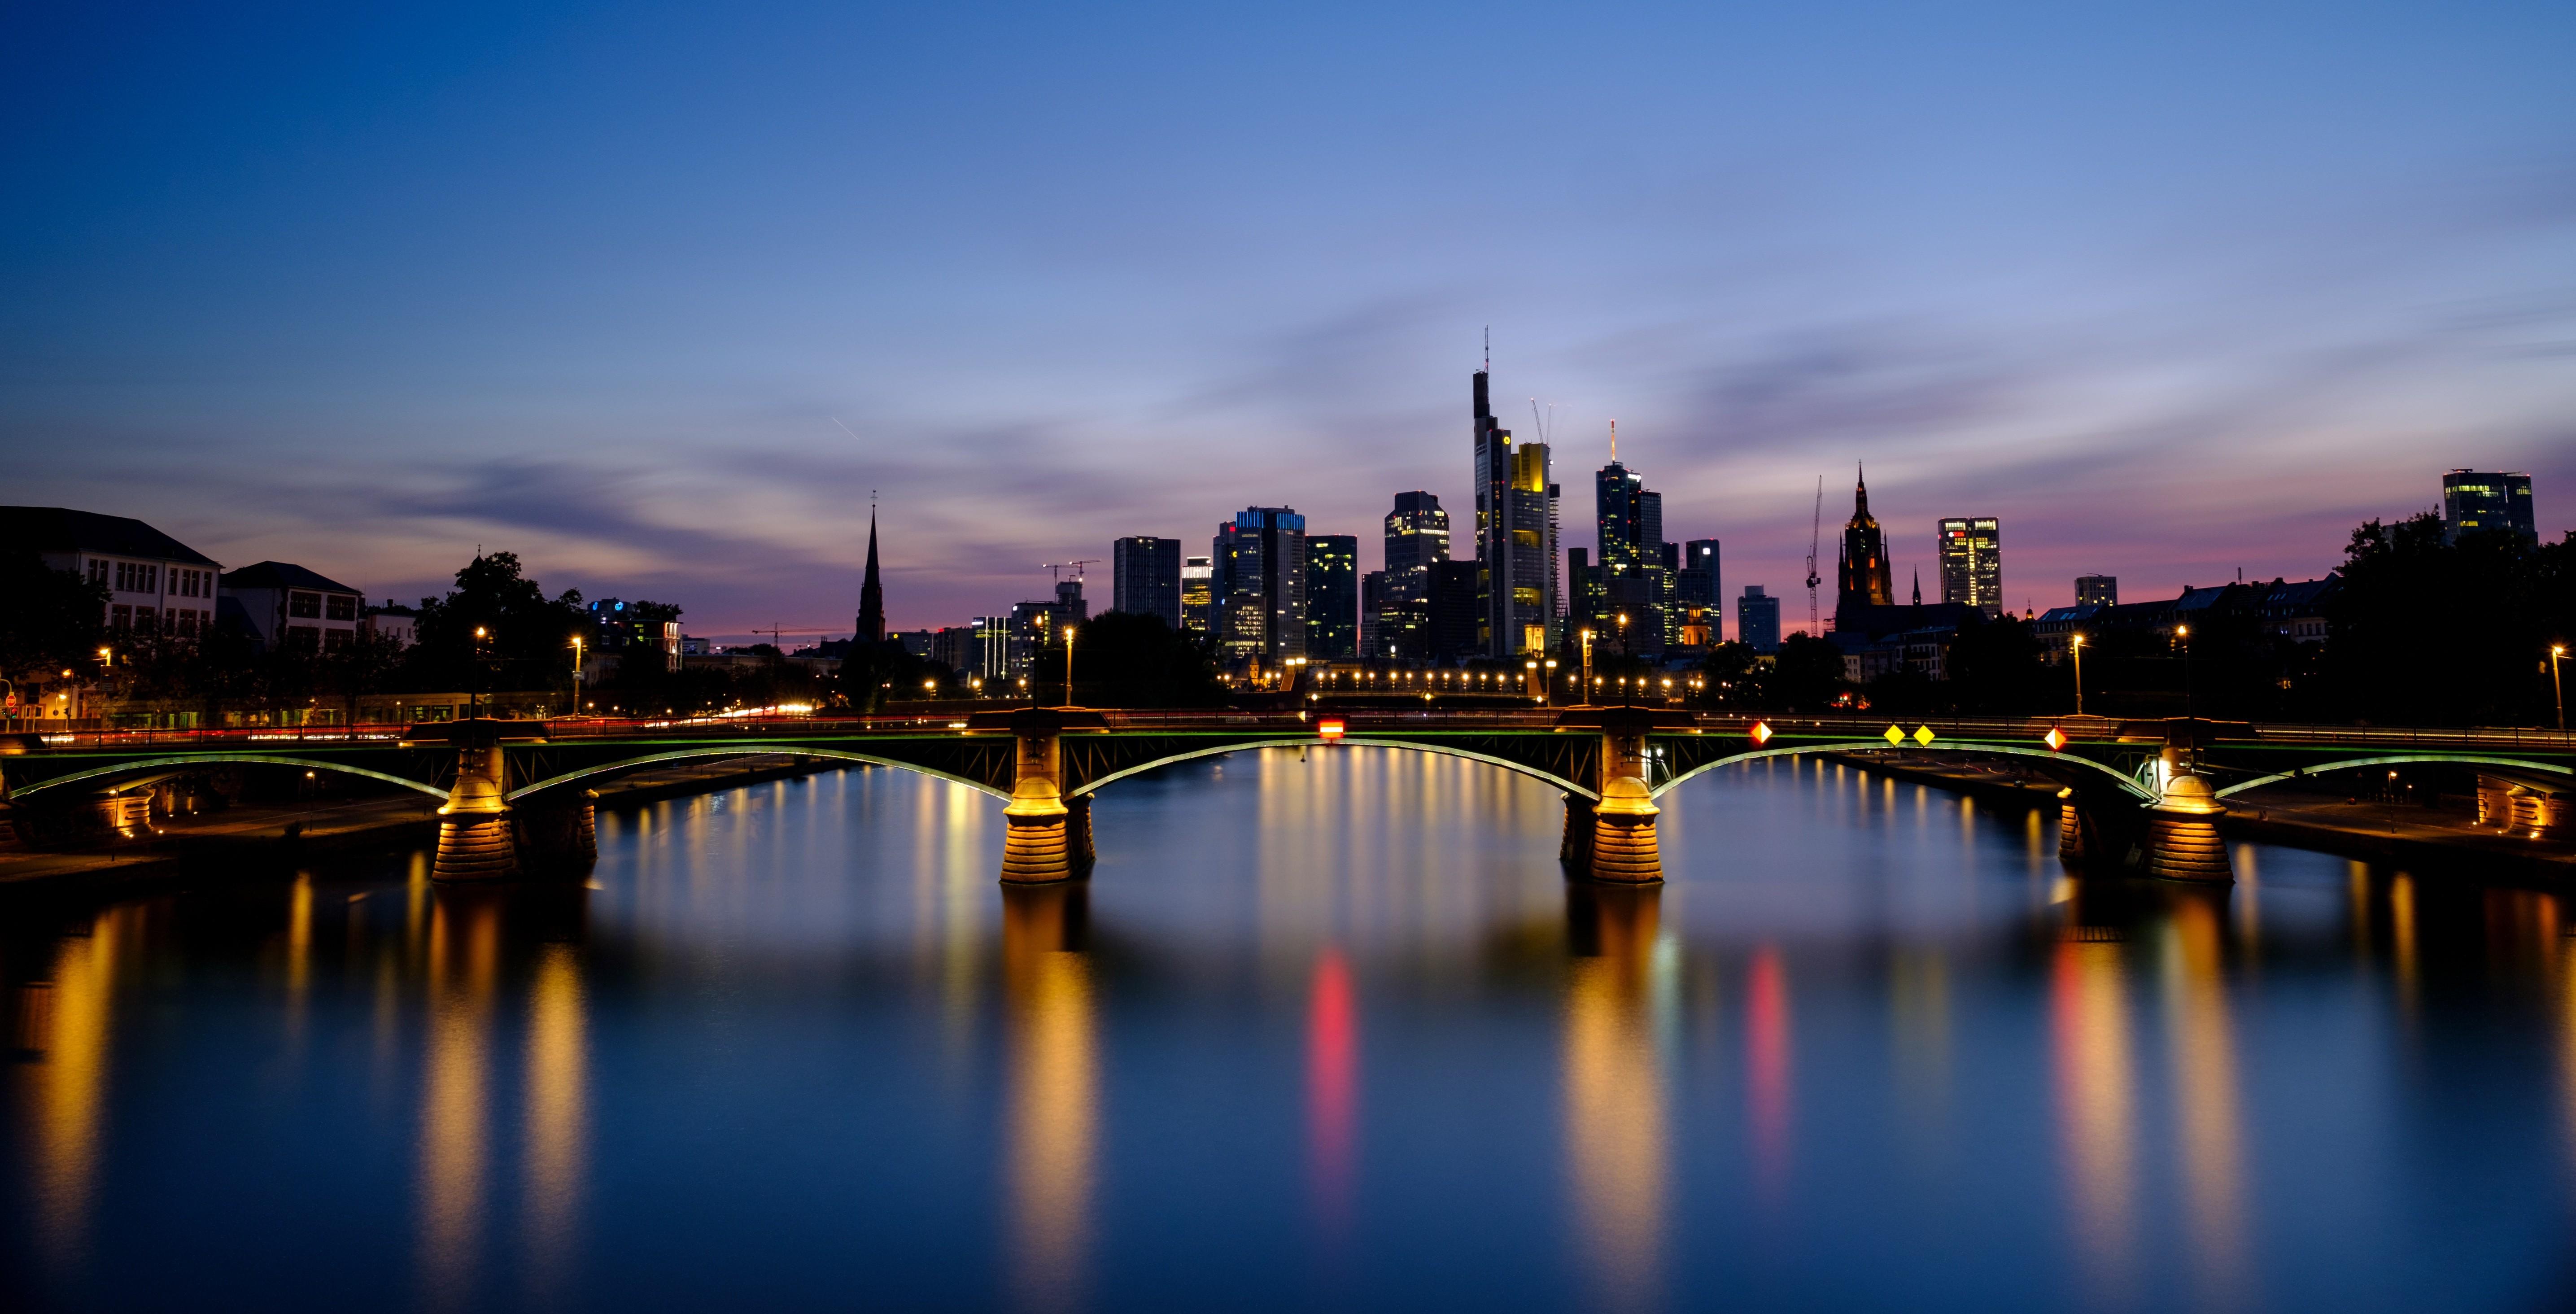 Frankfurt am Main - skyline at night